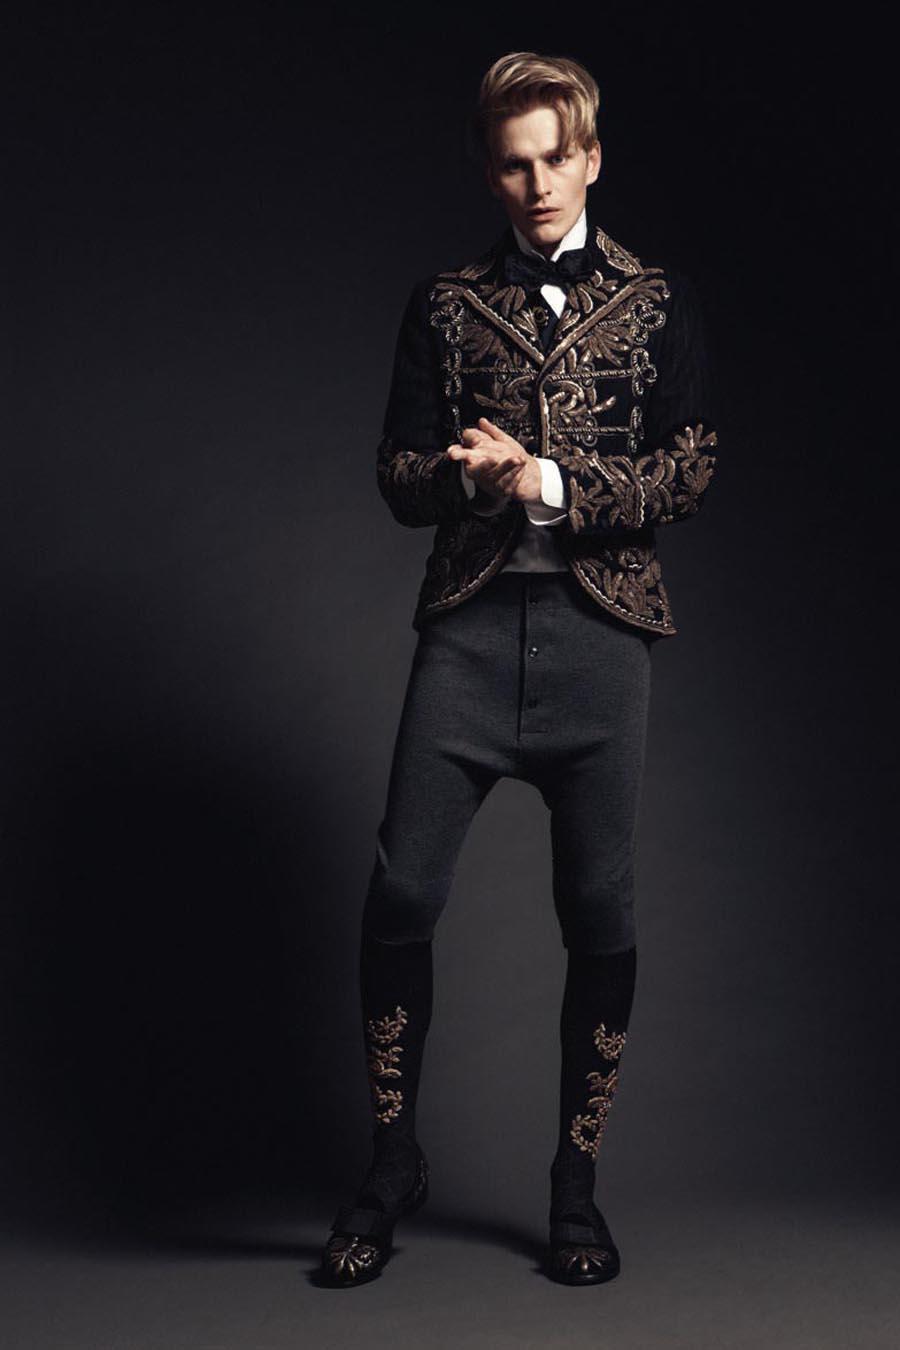 Gerhard Freidl0333_VIKTOR Magazine_Ph Adriano Russo(Wiener Models)